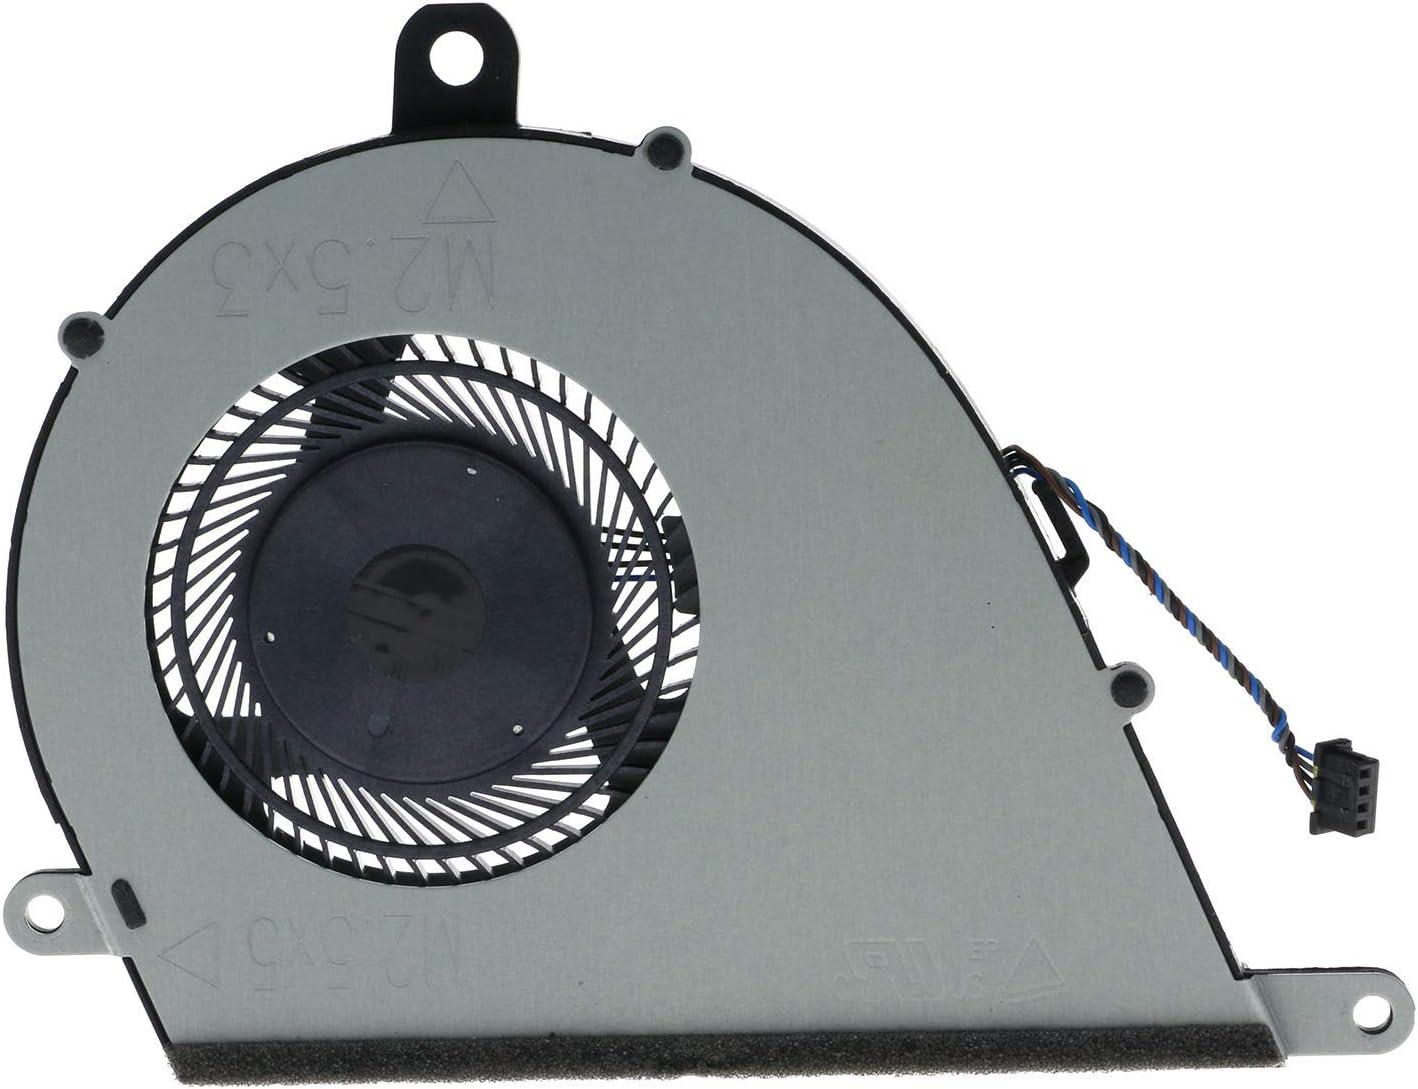 CPU Cooling Fan for HP Envy 15-A 15T-A 15-AS 15T-AS 15-AS068NR 15-AS014WM 857245-001